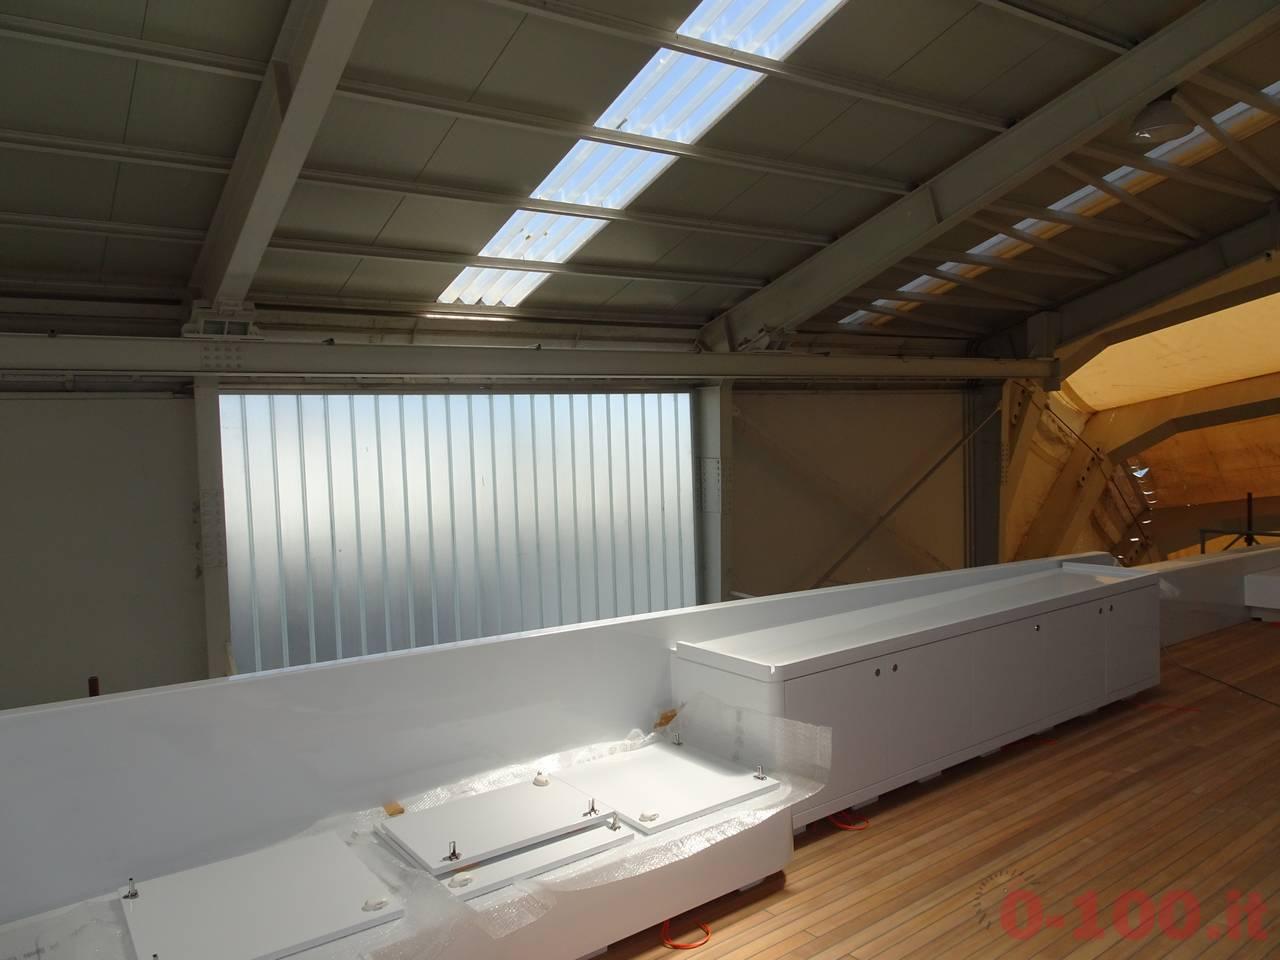 anteprima-mondiale-al-monaco-yacht-show-2016-otam-custom-range-sd35-35mt-my-gipsy-prezzo-price_0-10014